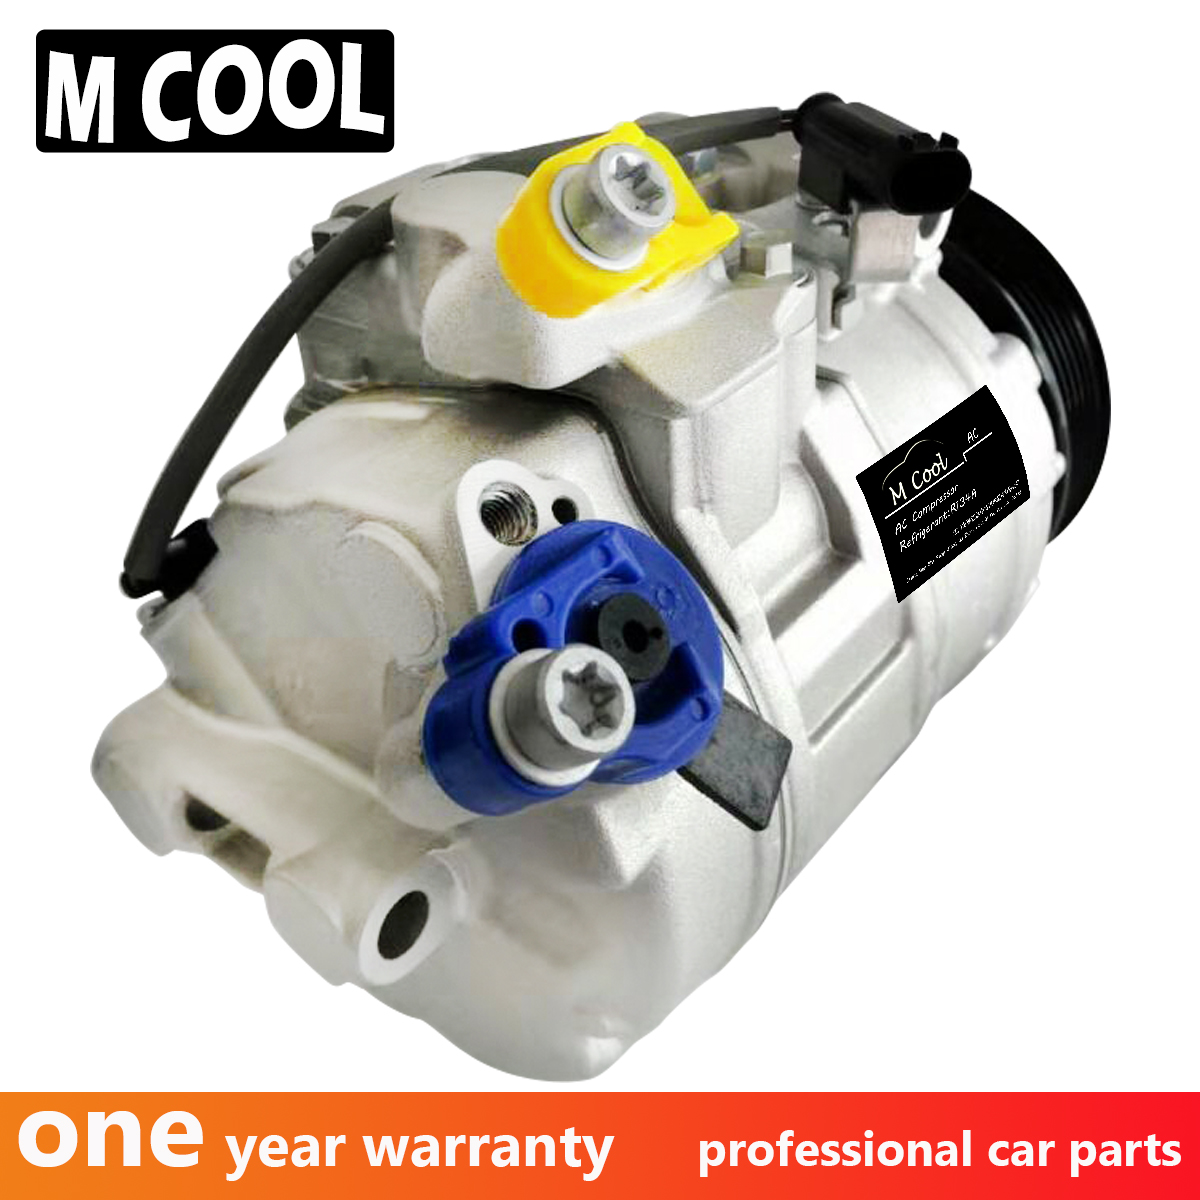 For 7SEU17C Auto AC Compressor BMW 1 E81 130 BMW 3 E90 325 330 E92 325 330 E91 325 330 2005 2012 6956716 64526956716 in Air conditioning Installation from Automobiles Motorcycles